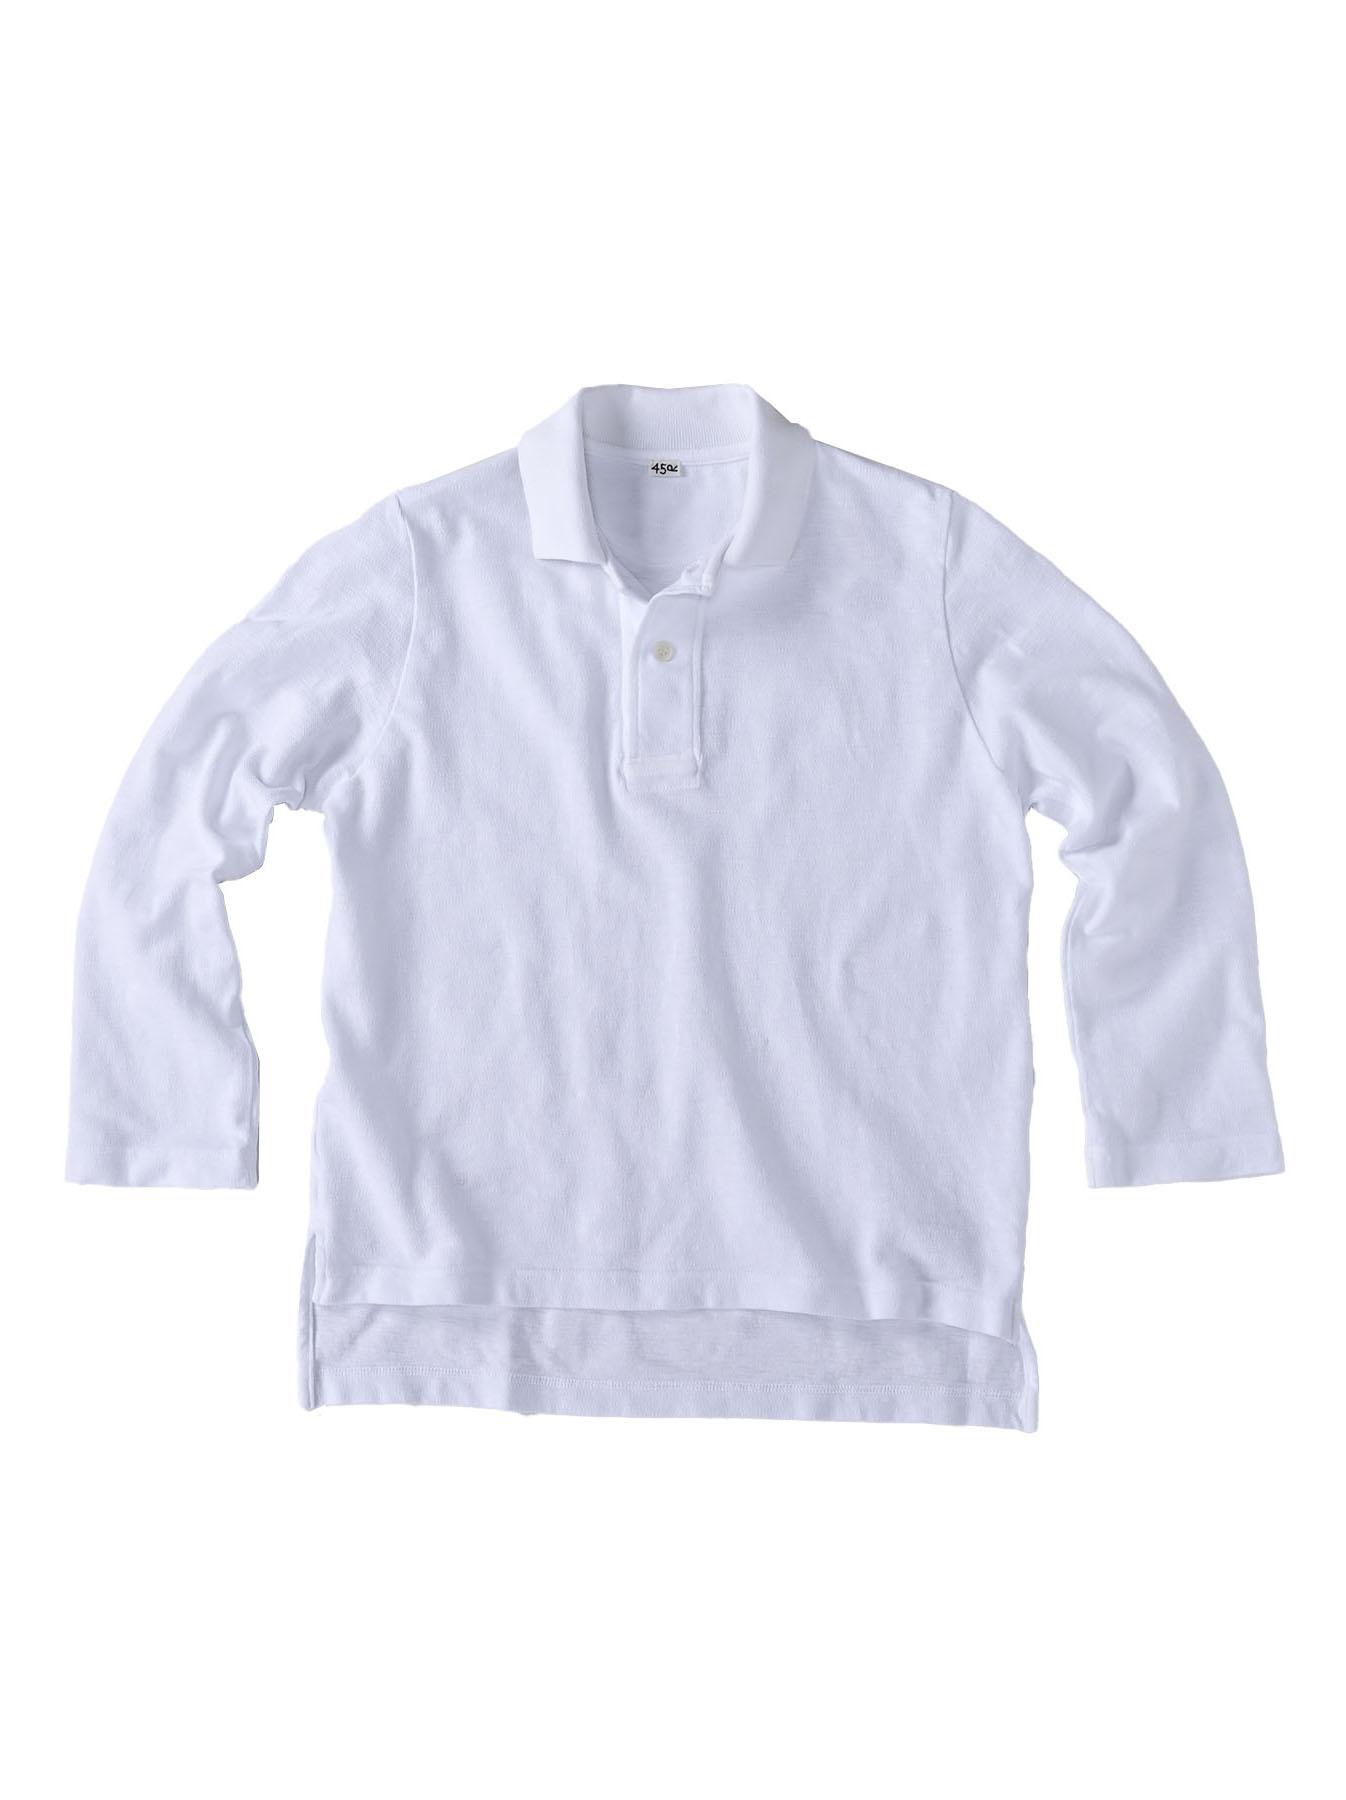 Kanoko Shiokaze Long-sleeved Square Polo Shirt (0521)-6